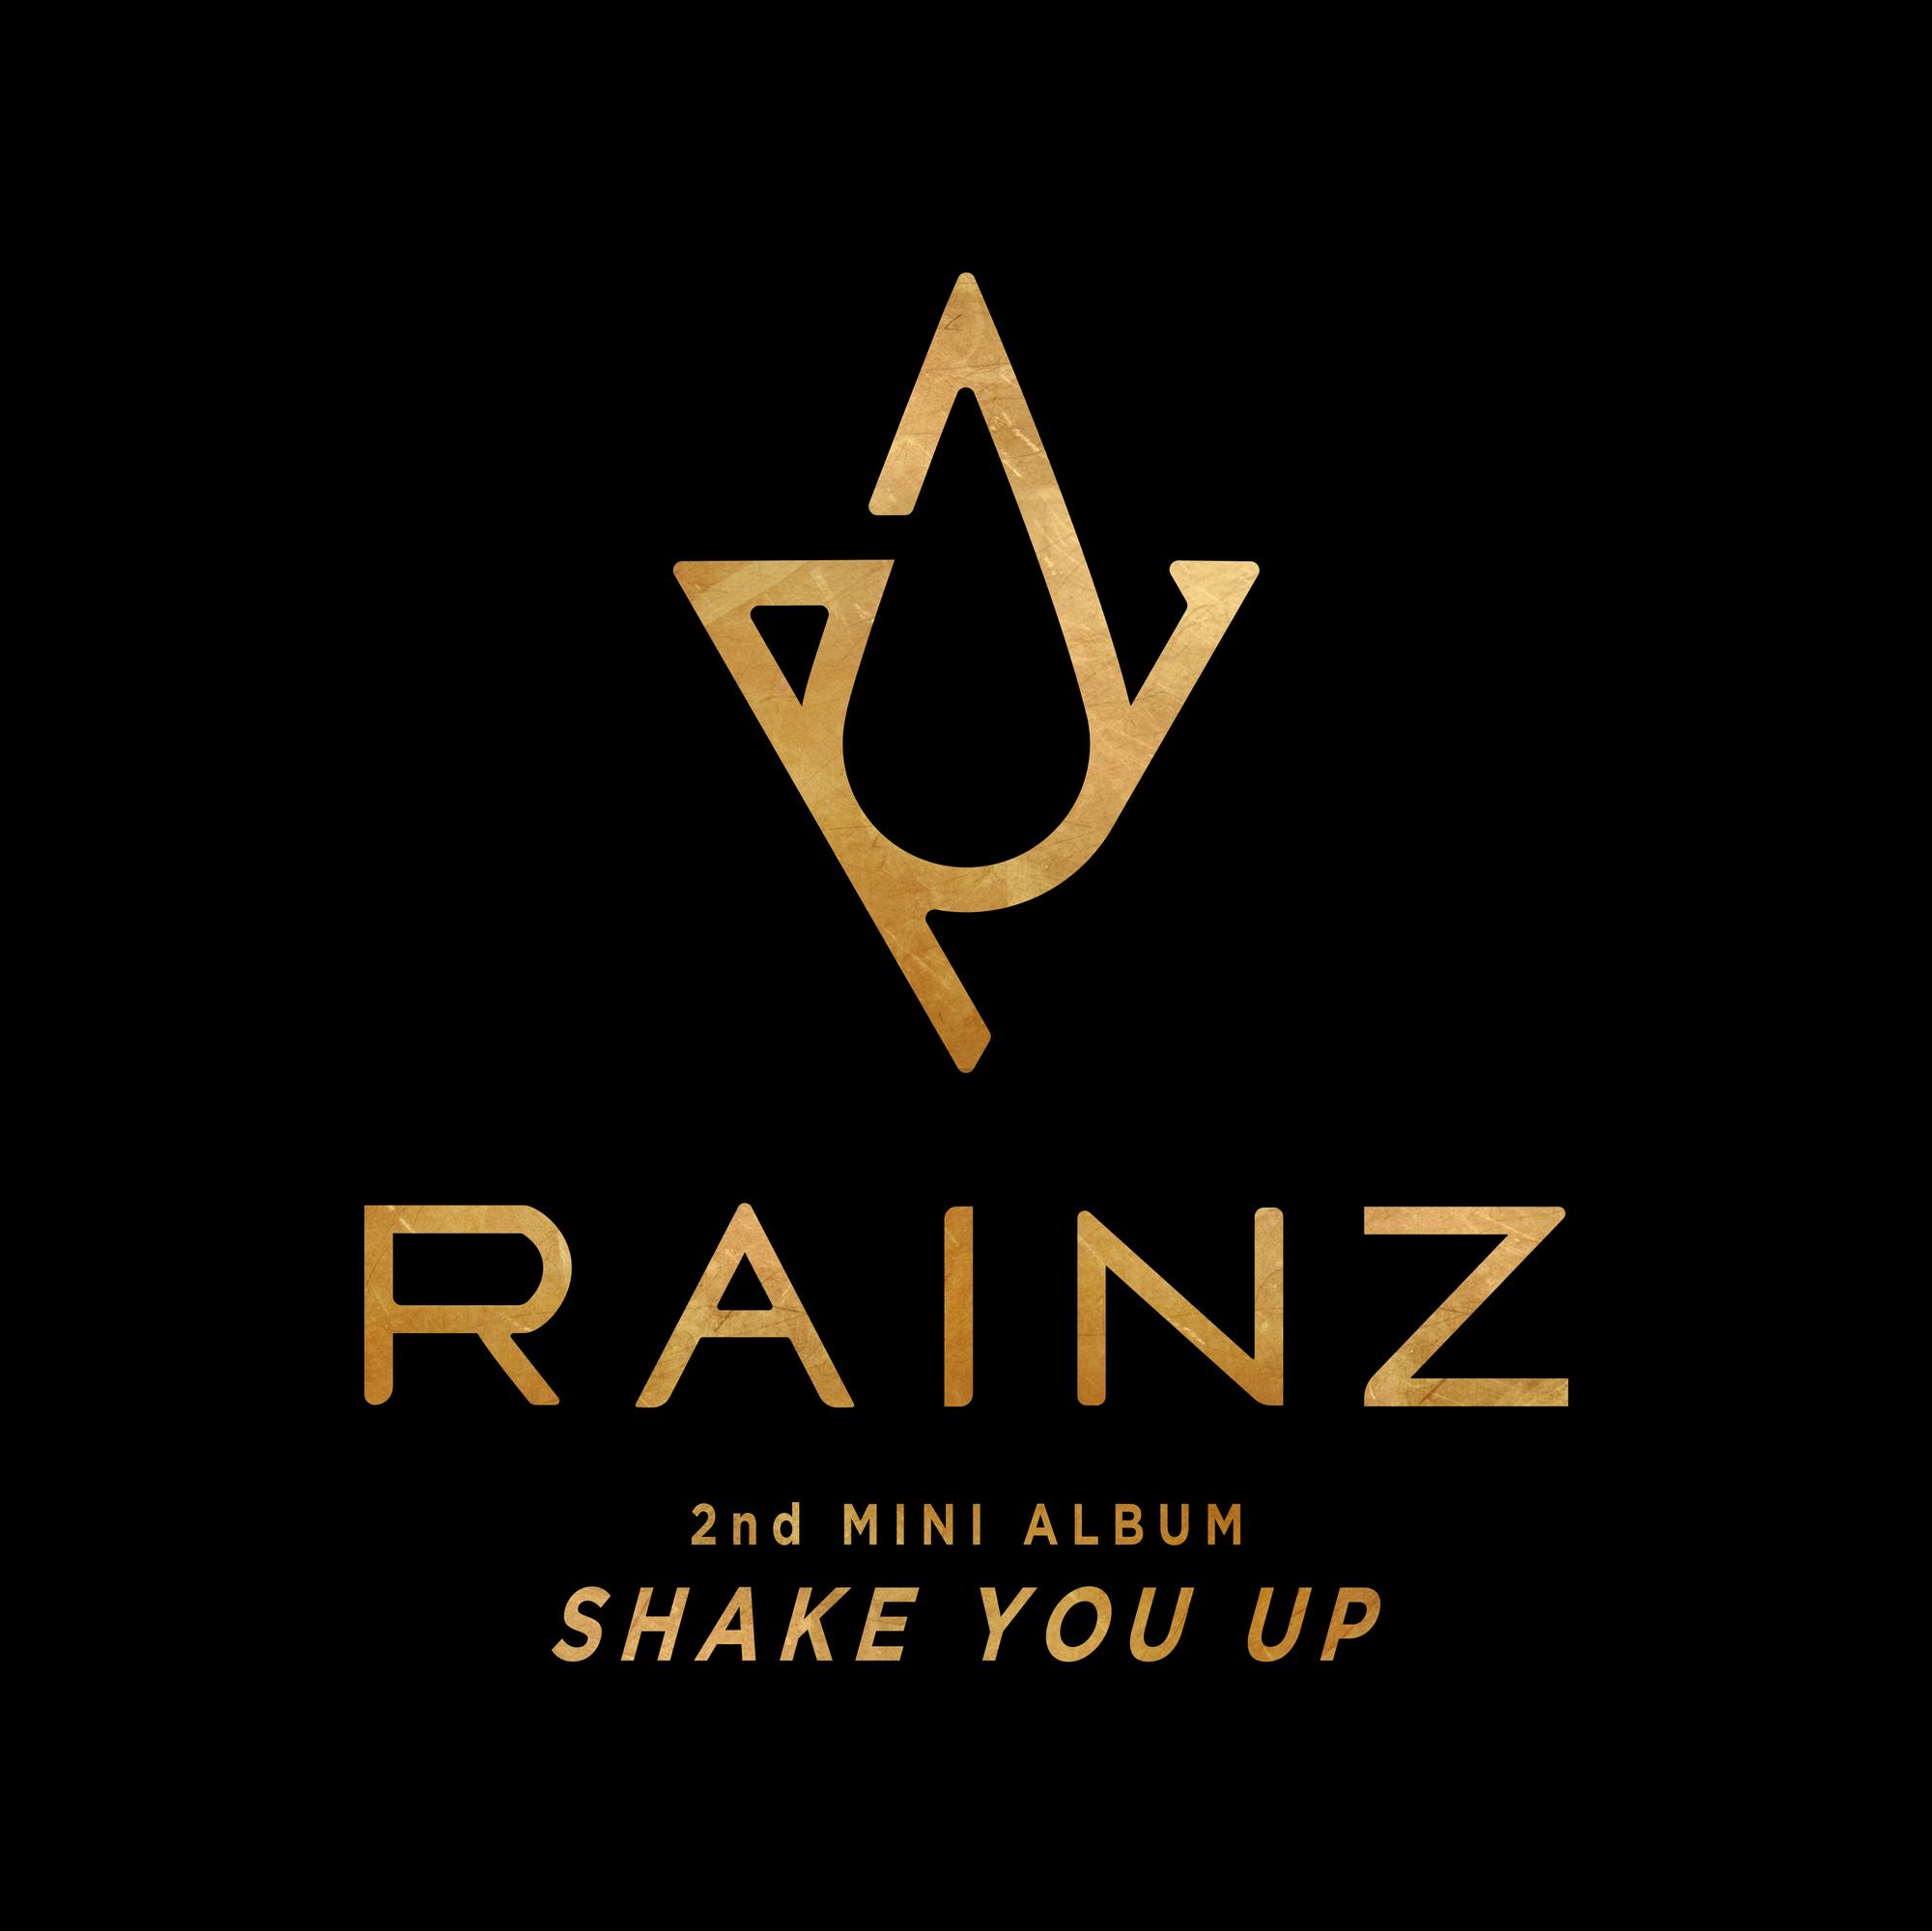 RAINZ 韓国 2nd MINI ALBUM 『SHAKE YOU UP』